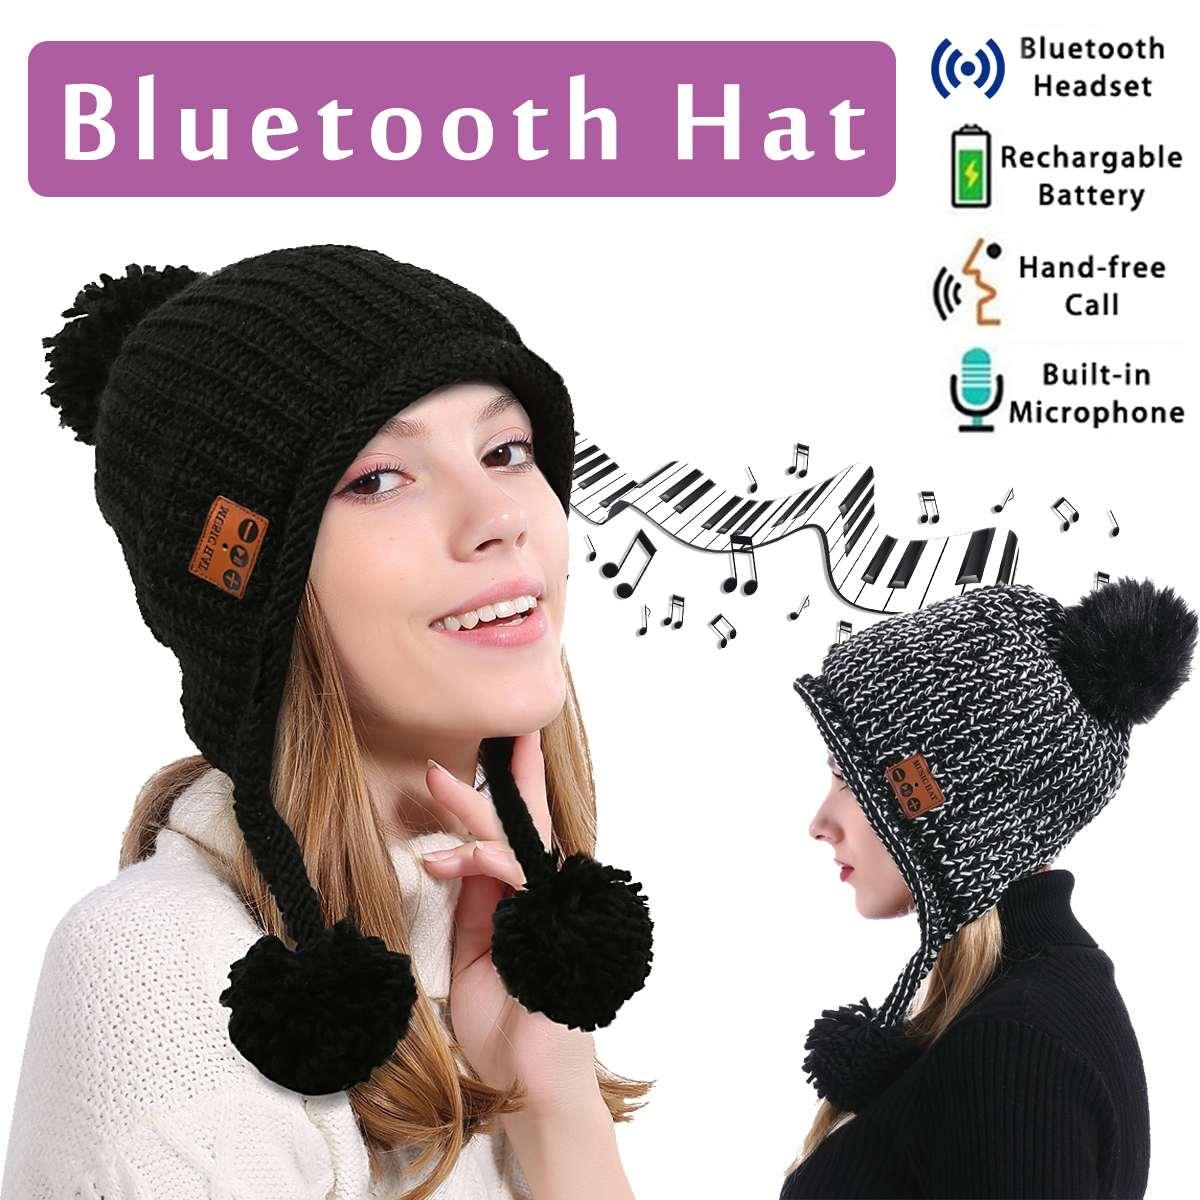 LEORY Winter Wireless bluetooth Headset Hat for Woman Outdoor Fashion bluetooth V4.2 Cap Headphone Warm Hats Music Earphone